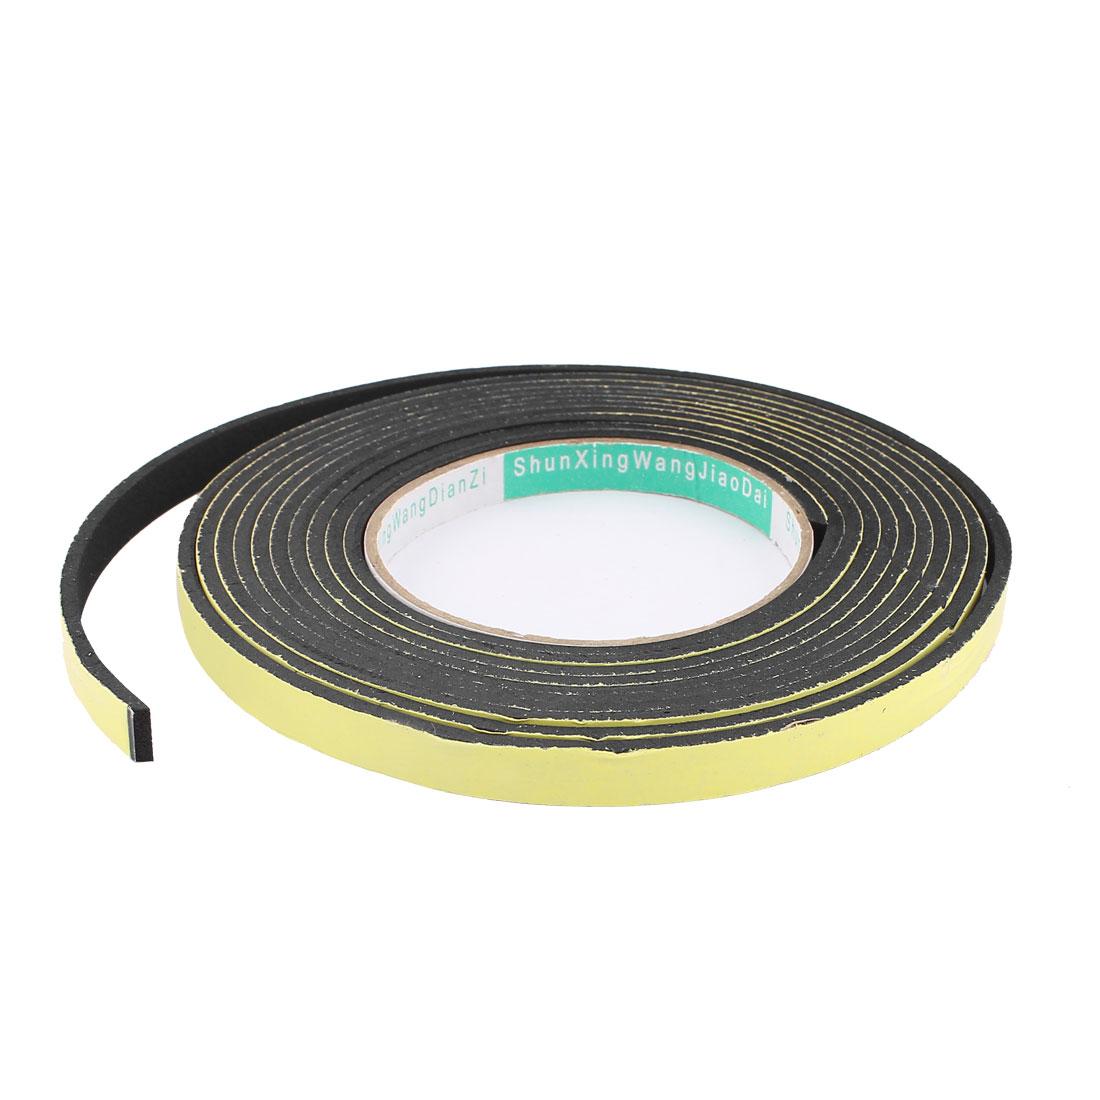 4M 10mm x 3mm Single Side Adhesive Foam Sealing Tape for Door Window